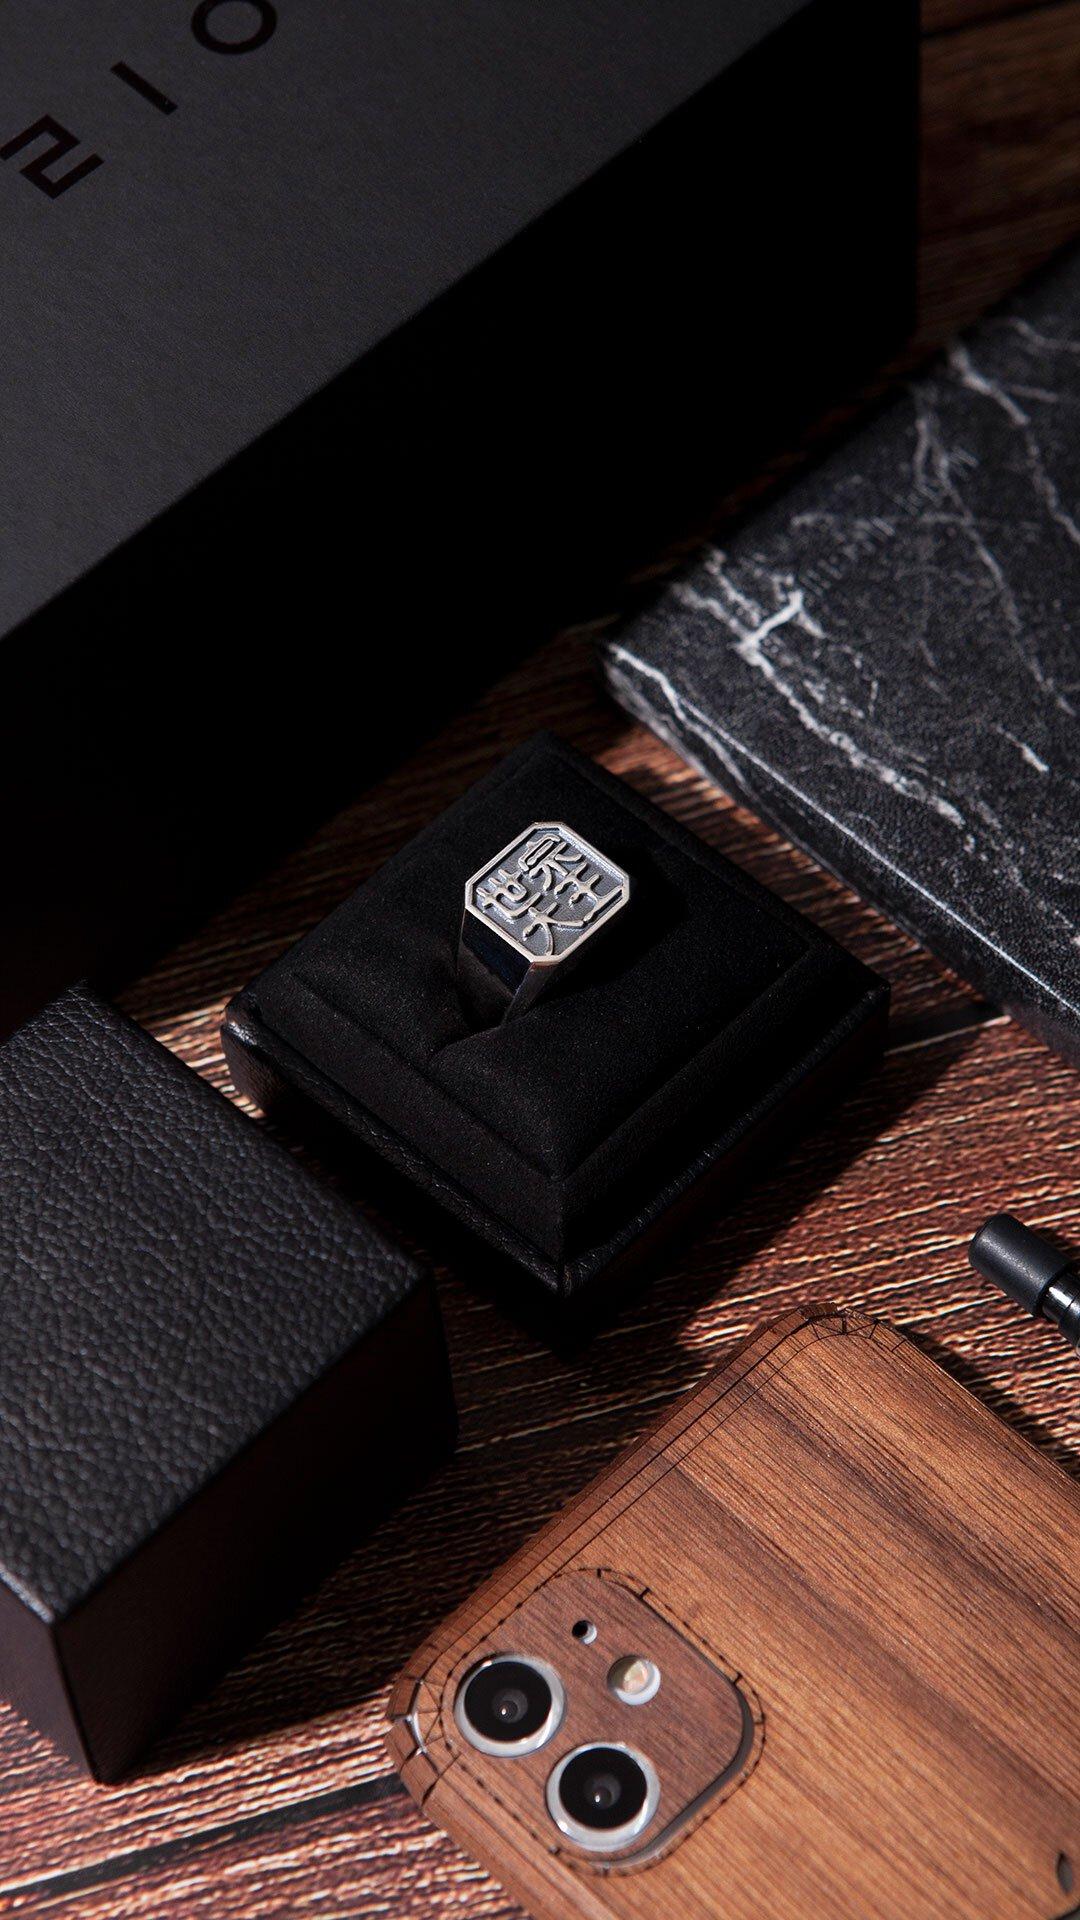 1ING[일링] 옥타곤 원링(각인) 은(Silver) 소재 컨셉 사진 1